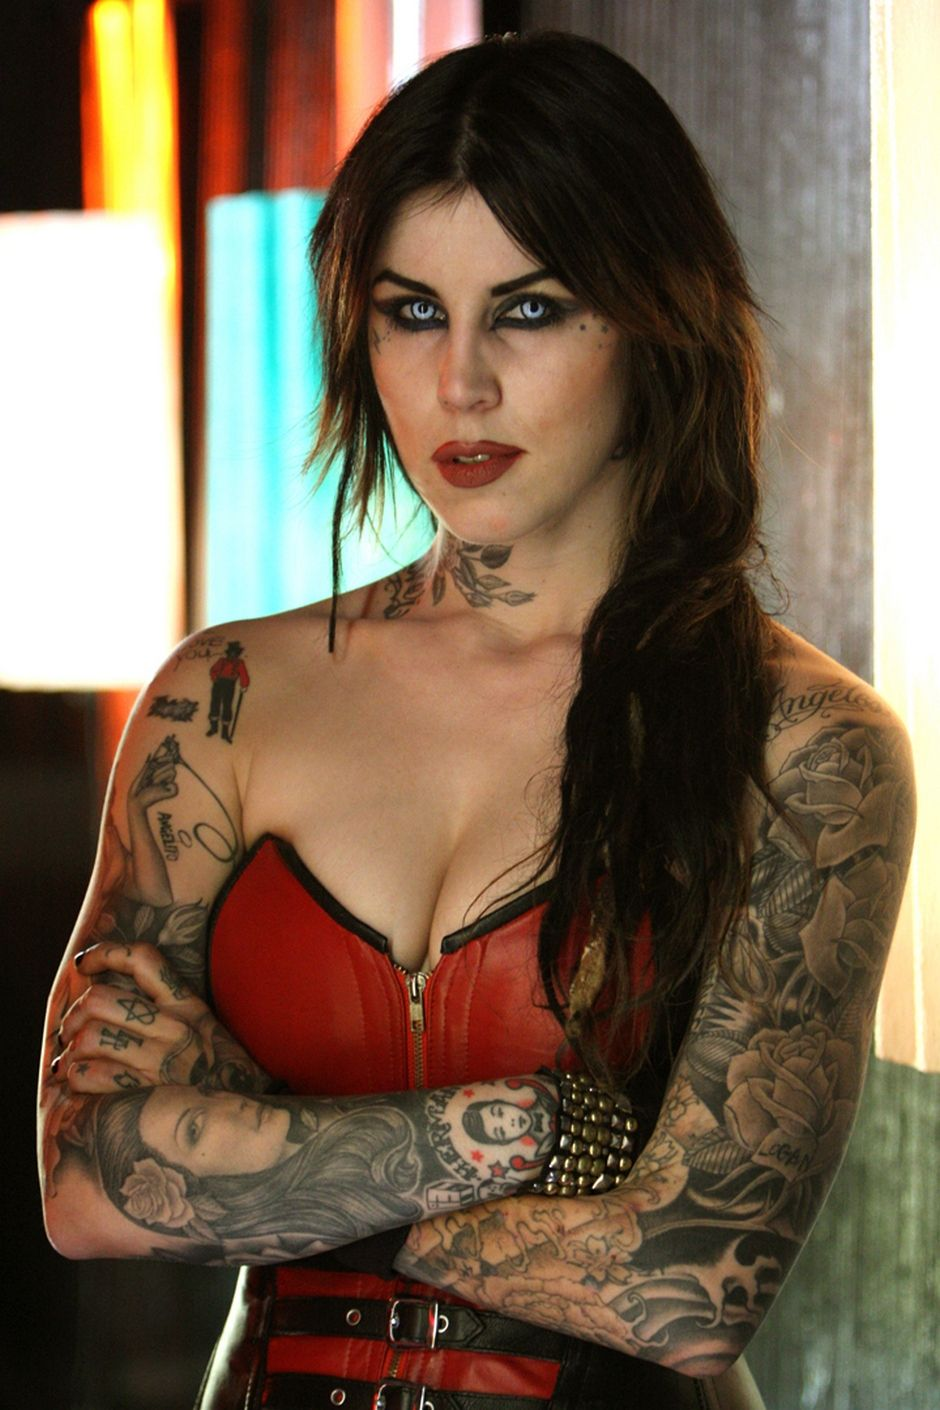 kat von d in the bleeding 2009 movie image tattoos pinterest kat von tattoo and tatting. Black Bedroom Furniture Sets. Home Design Ideas